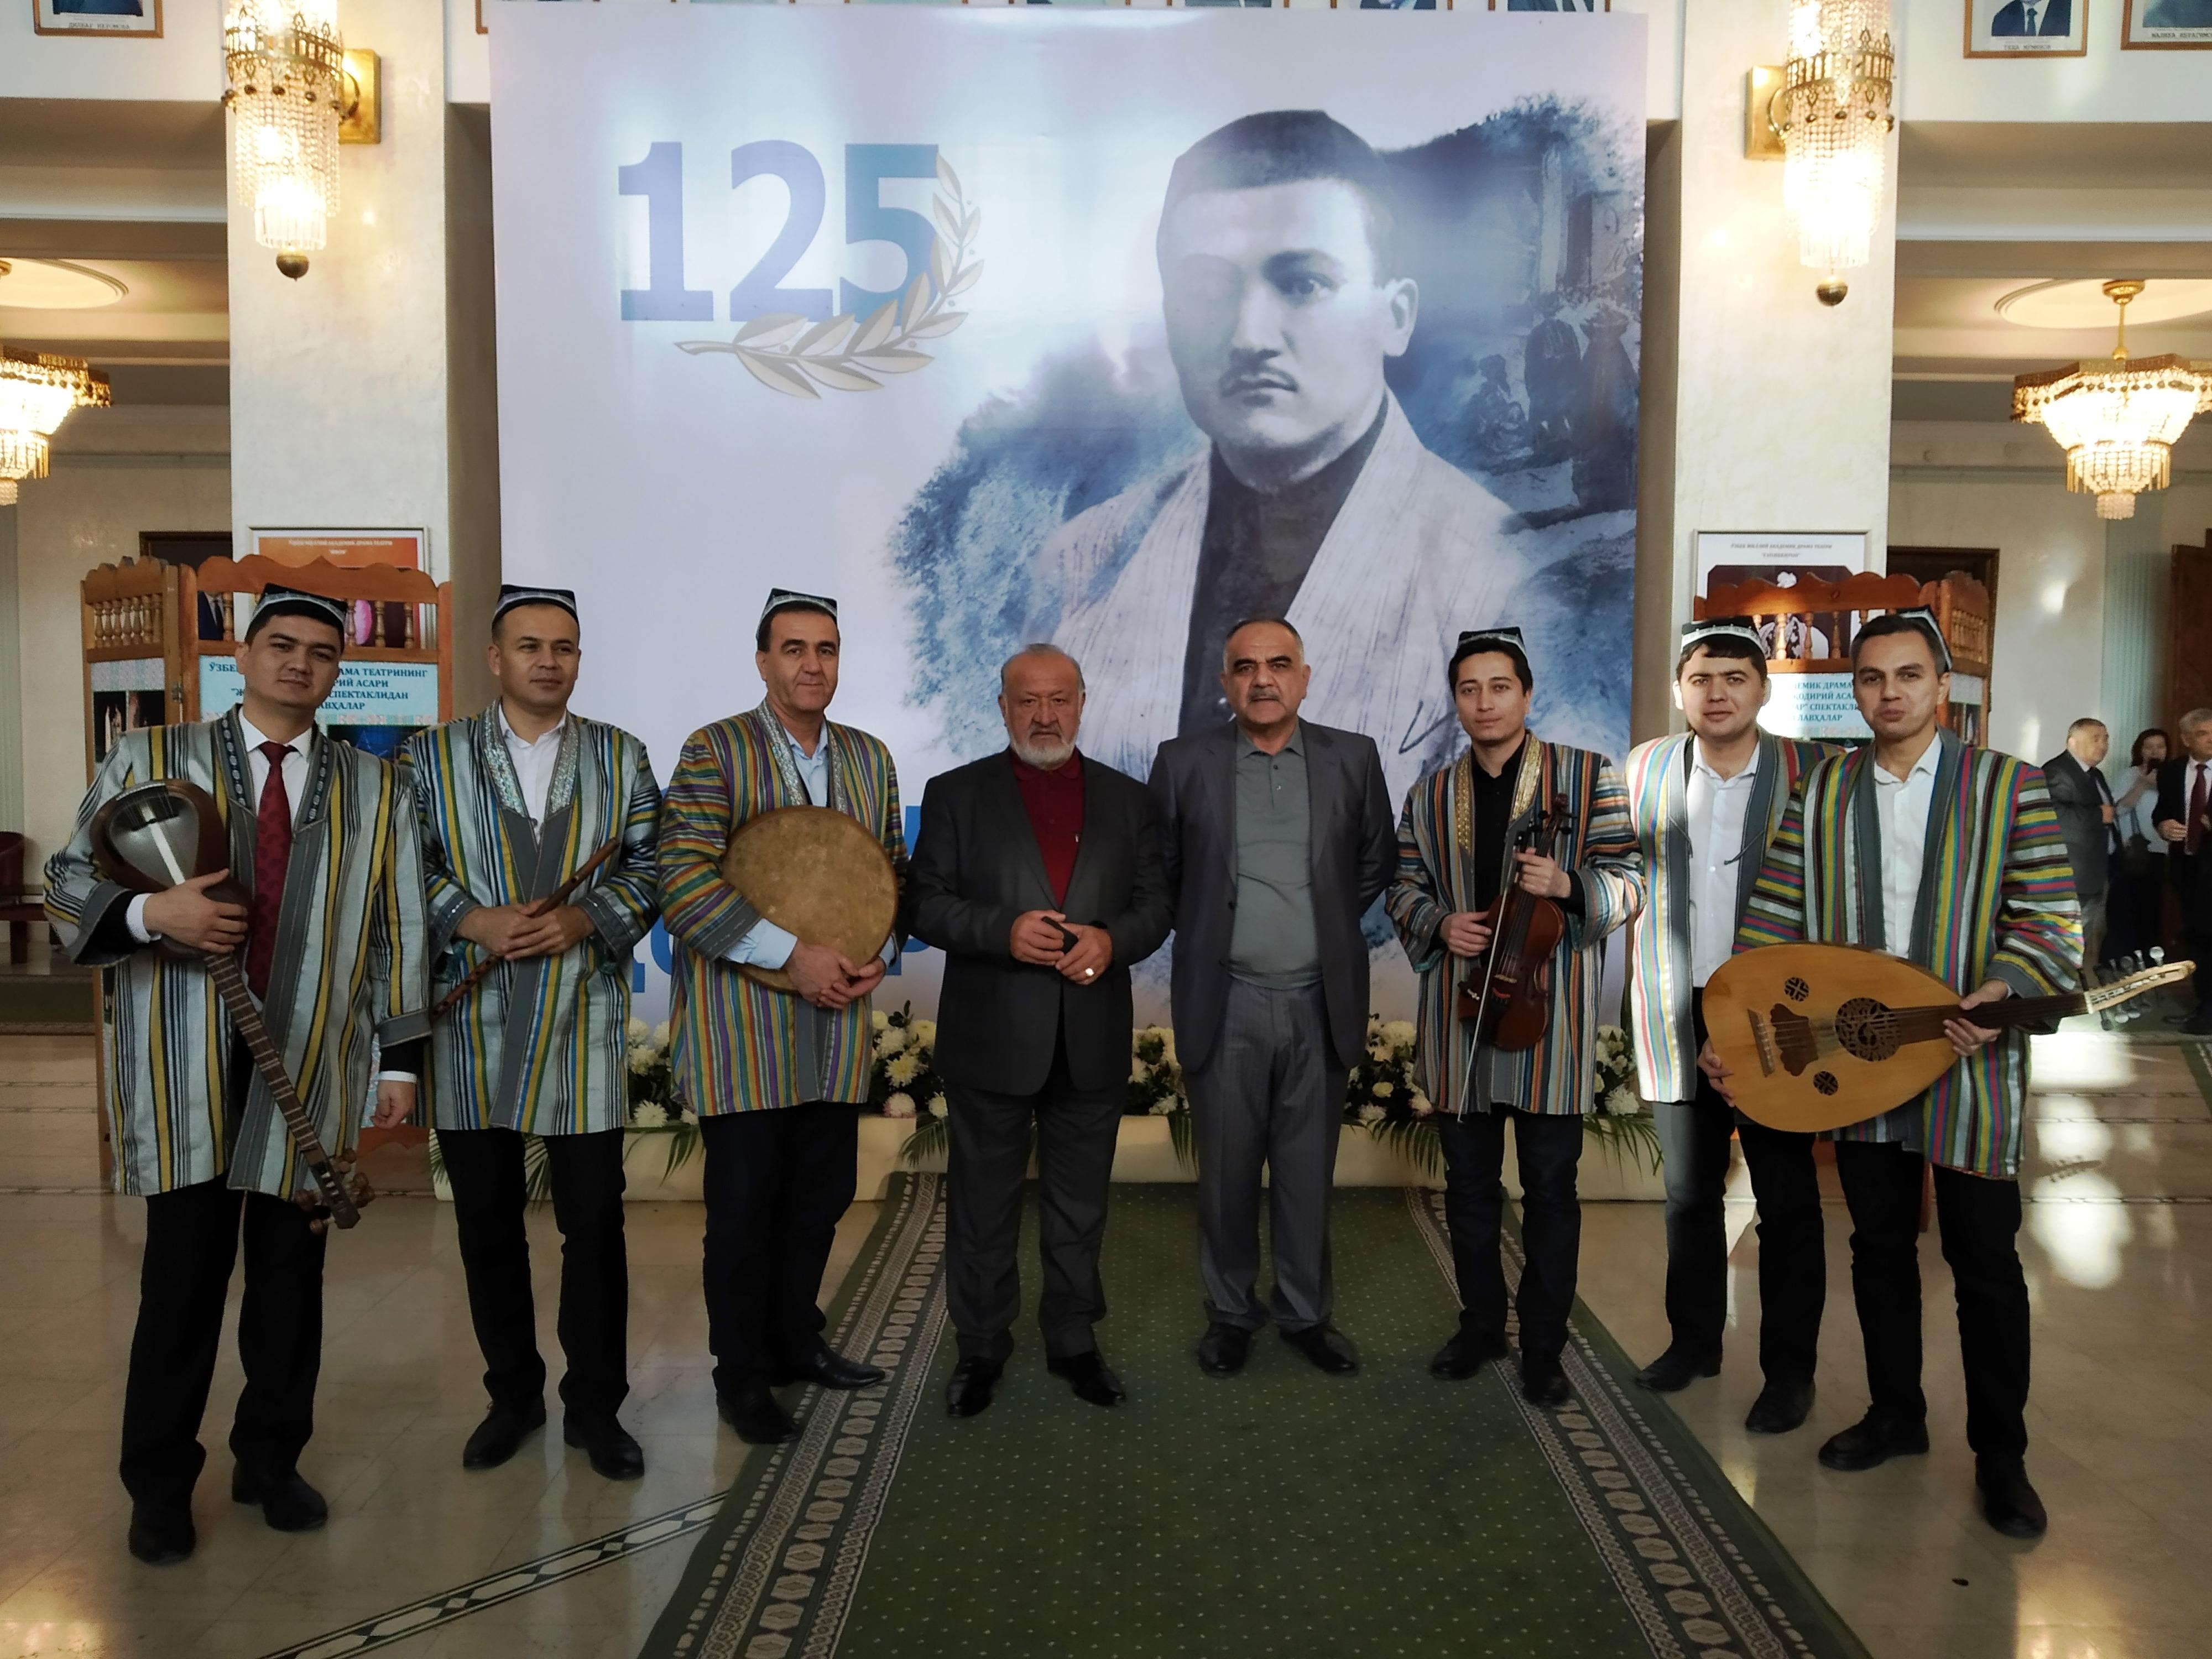 Абдулла Кодирийнинг 125 йиллик юбилейи ўтказилади